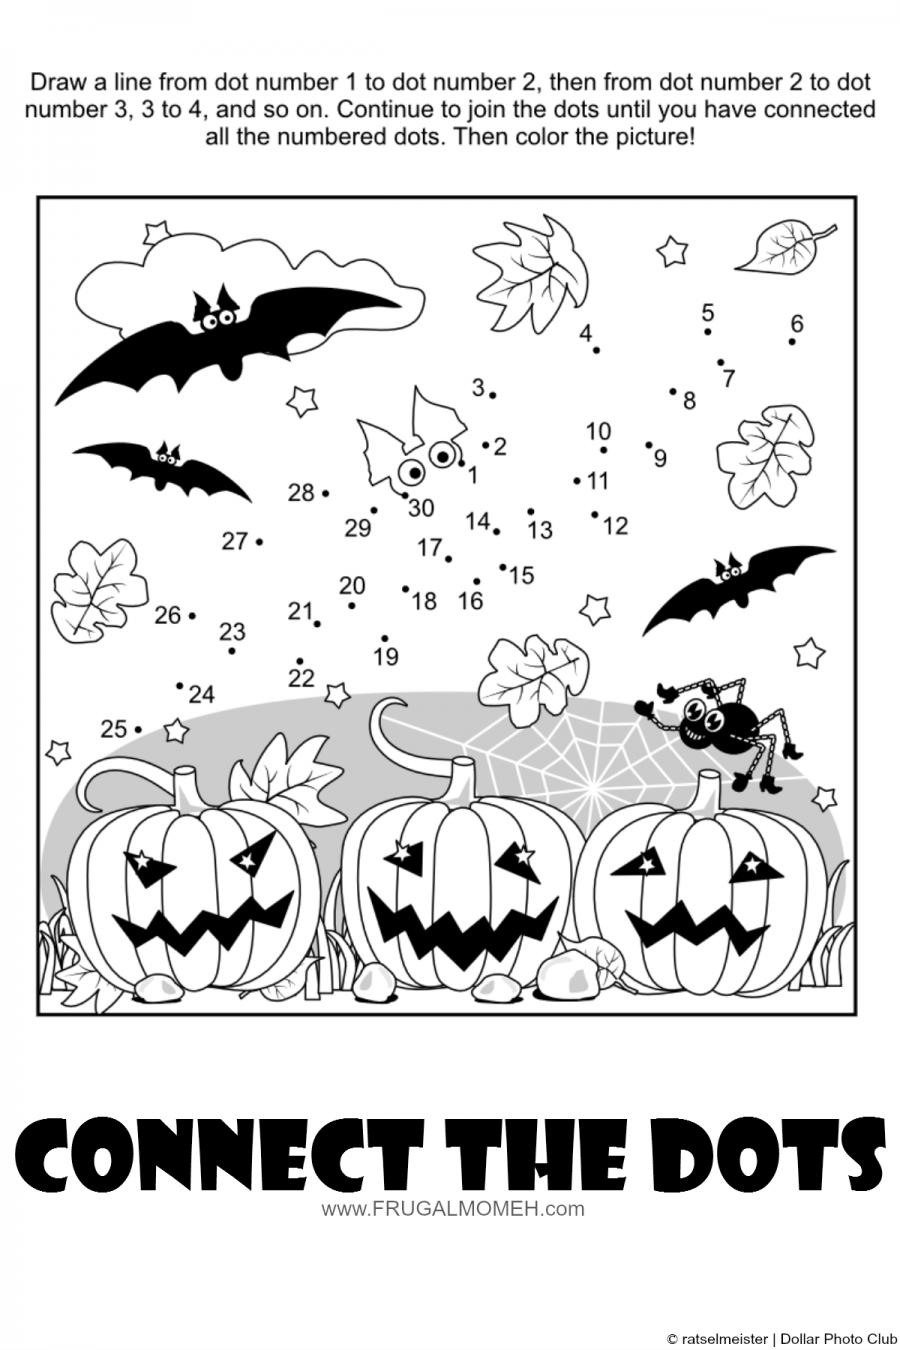 FREE Halloween Printable Activity Sheets for Kids | Halloween ...